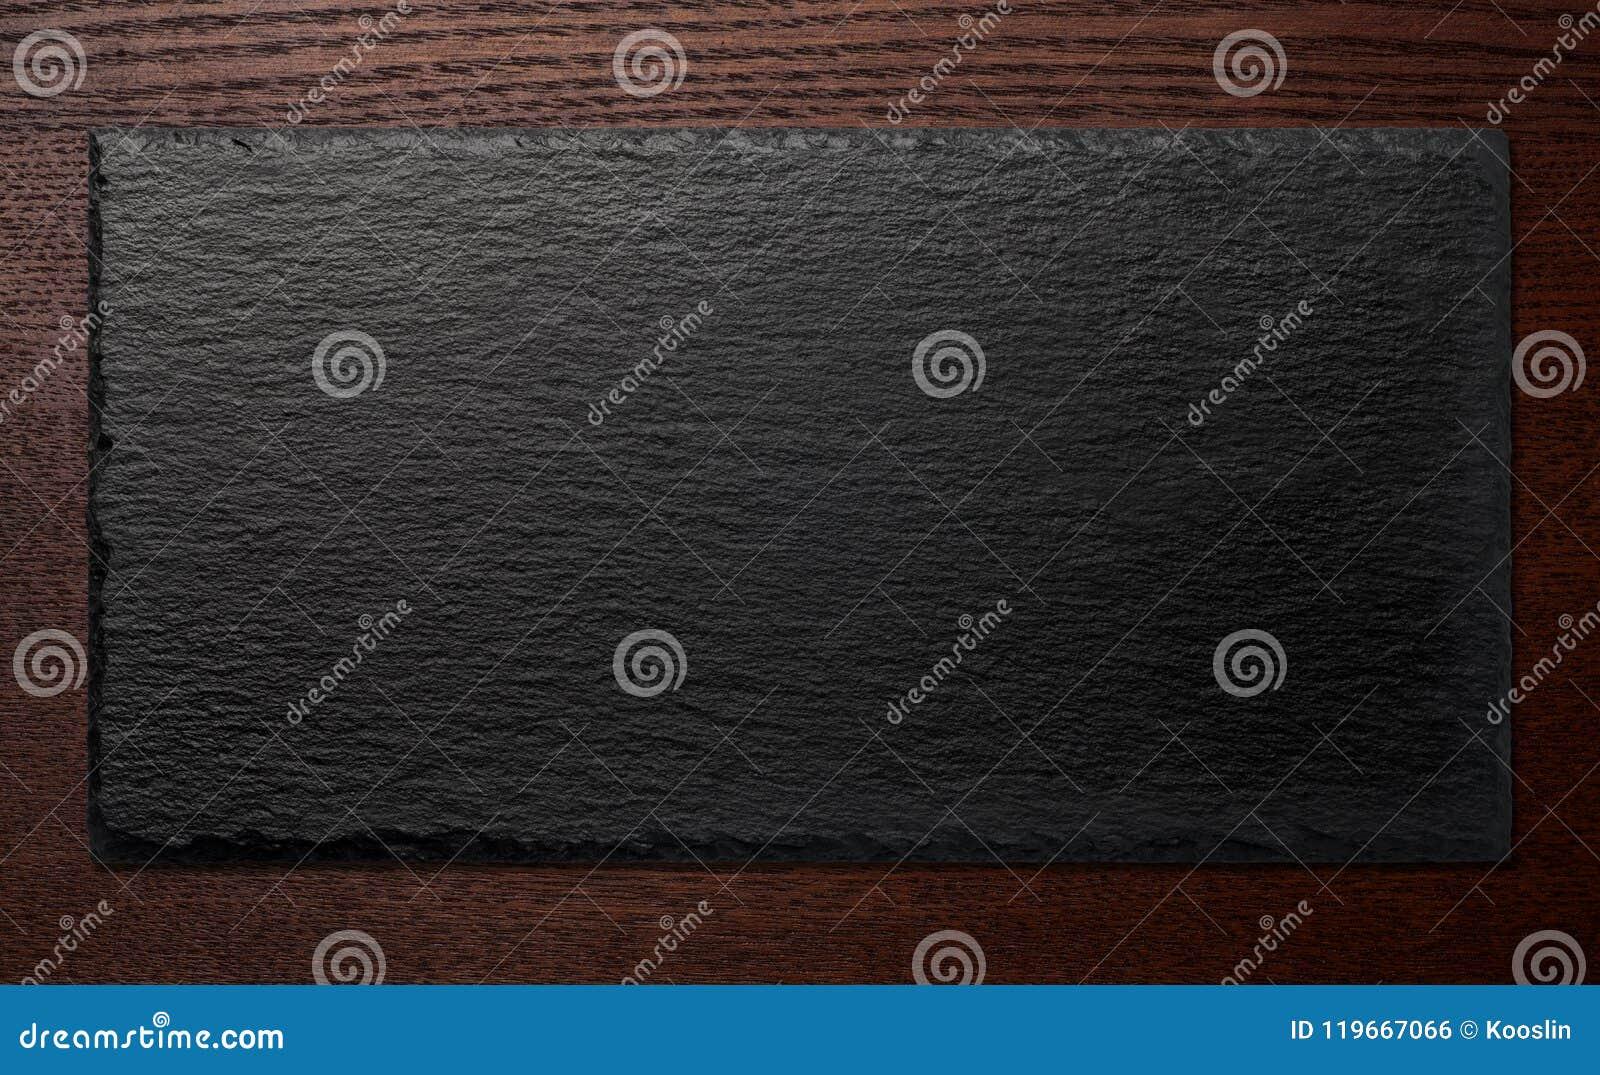 black stone plate stock photo image of dark stone 119667066